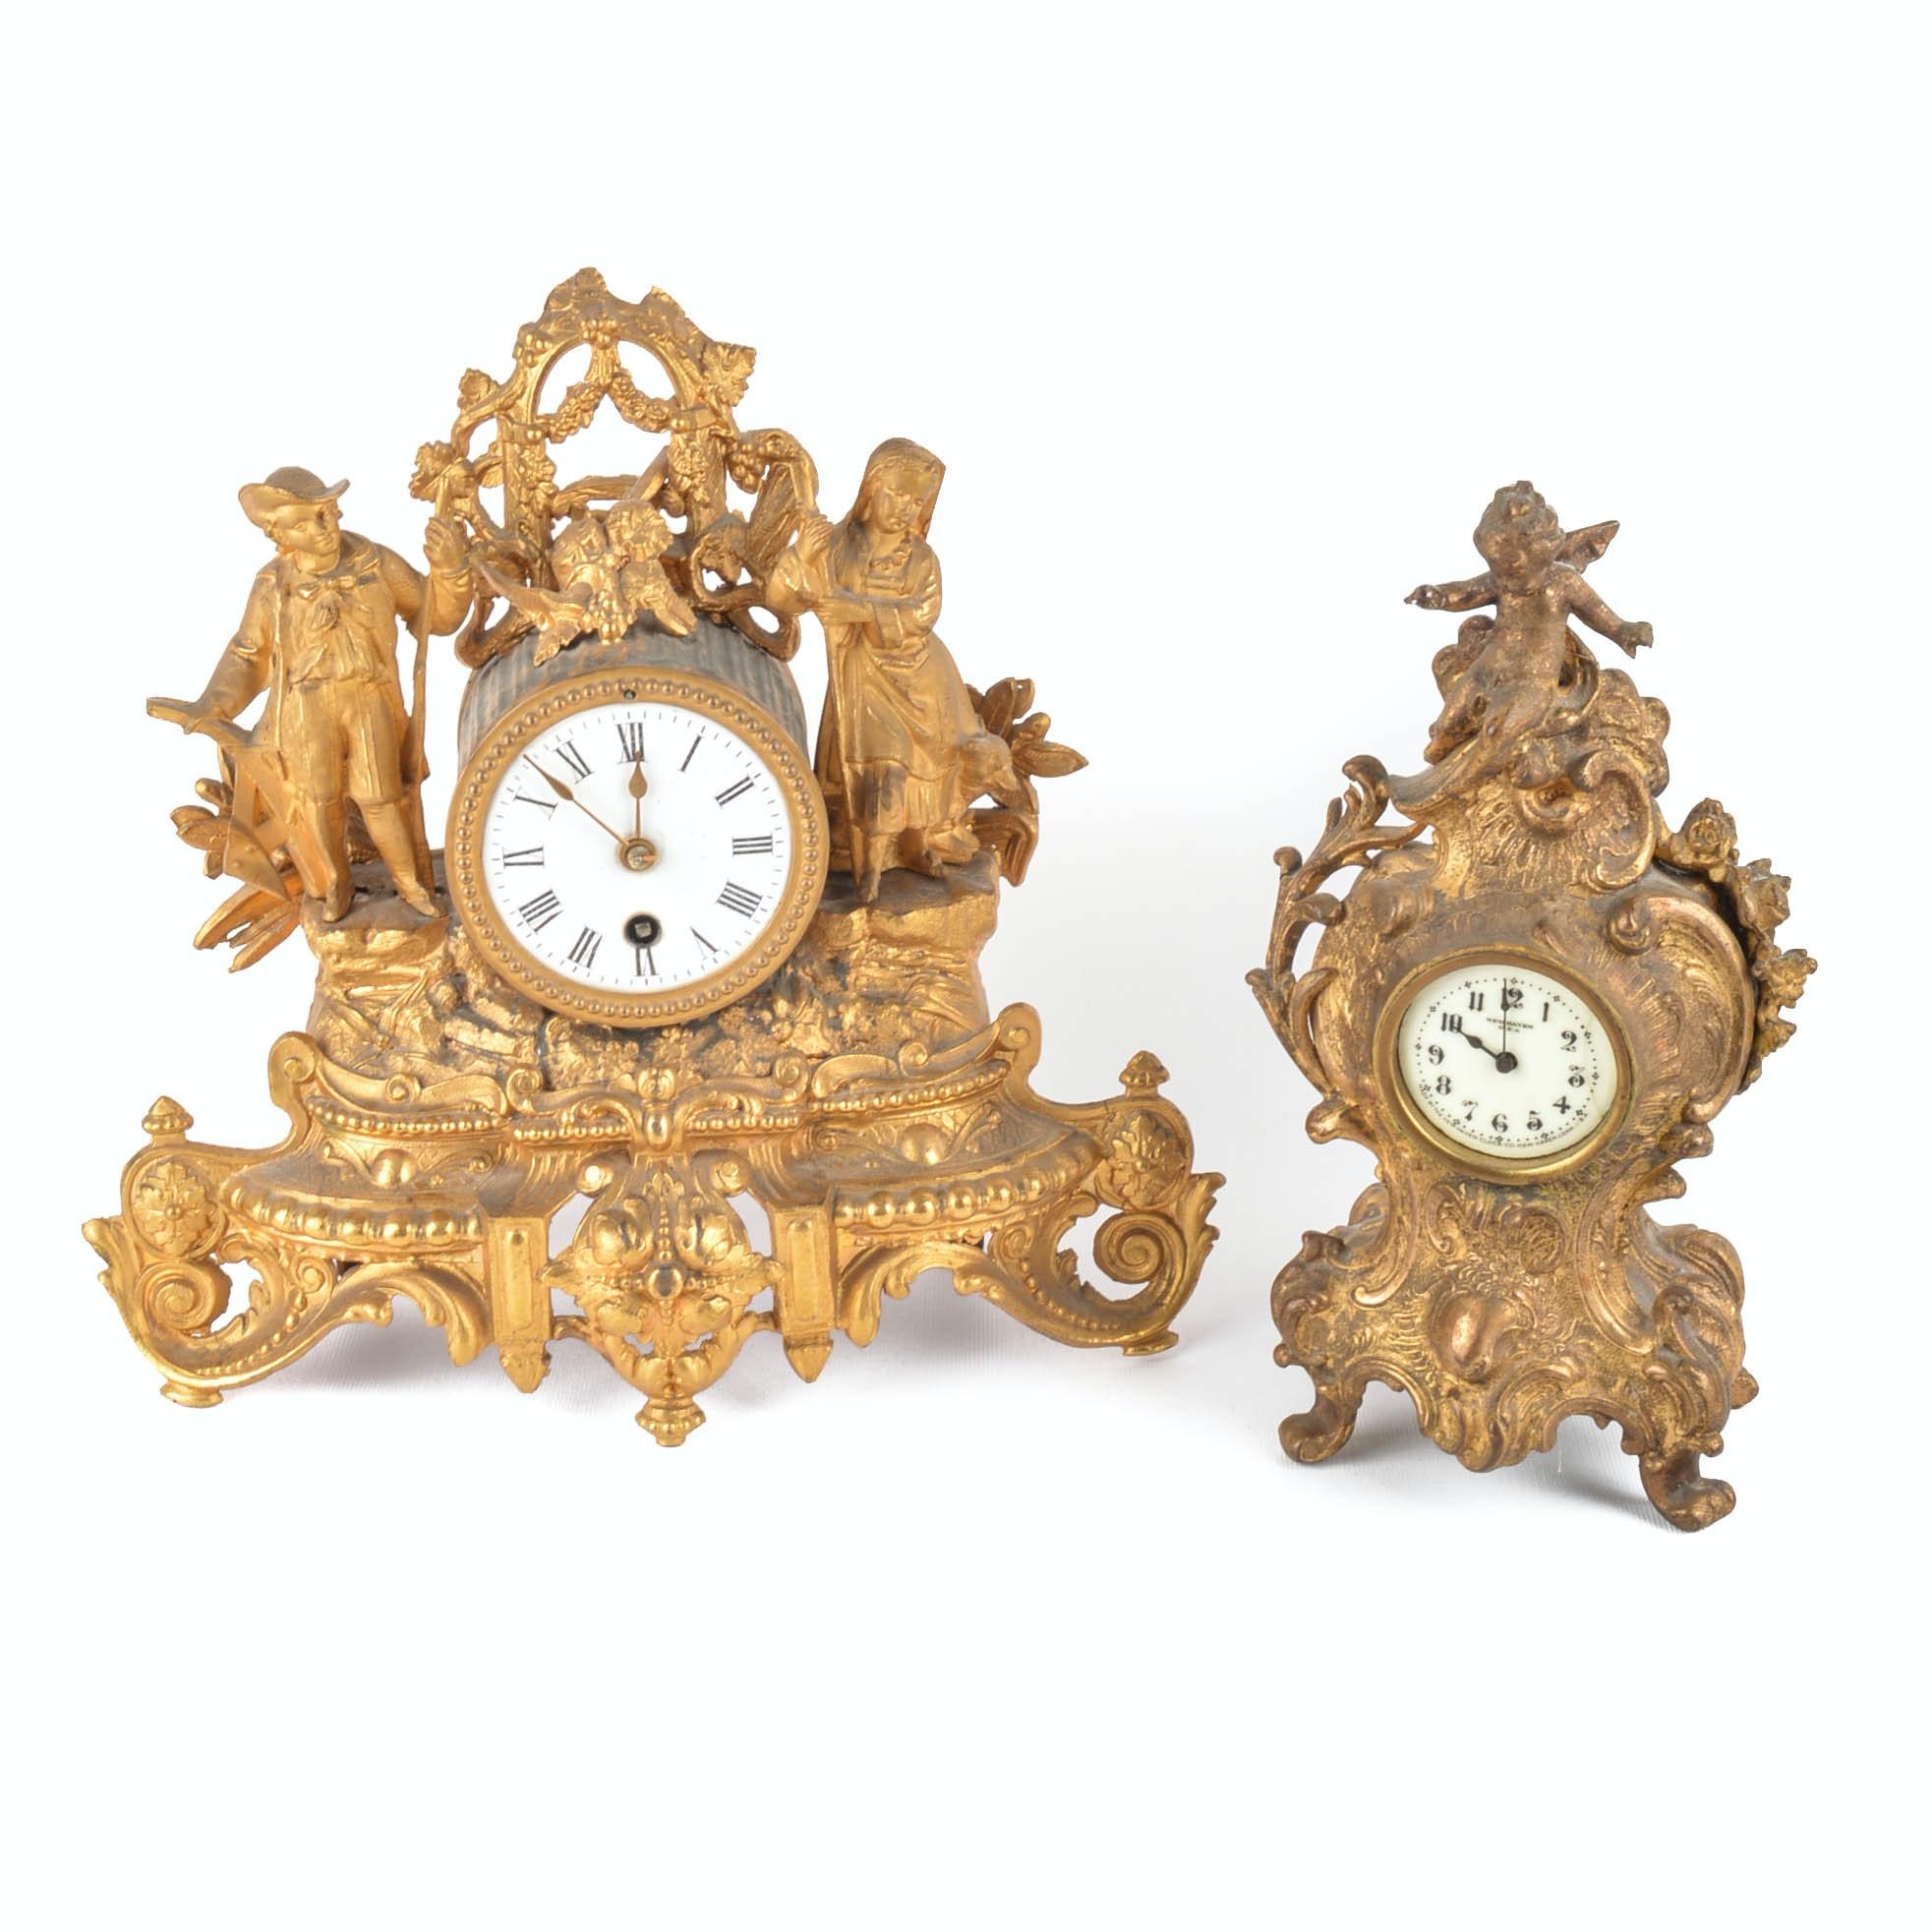 Two Vintage Ornamental Mantle Clocks